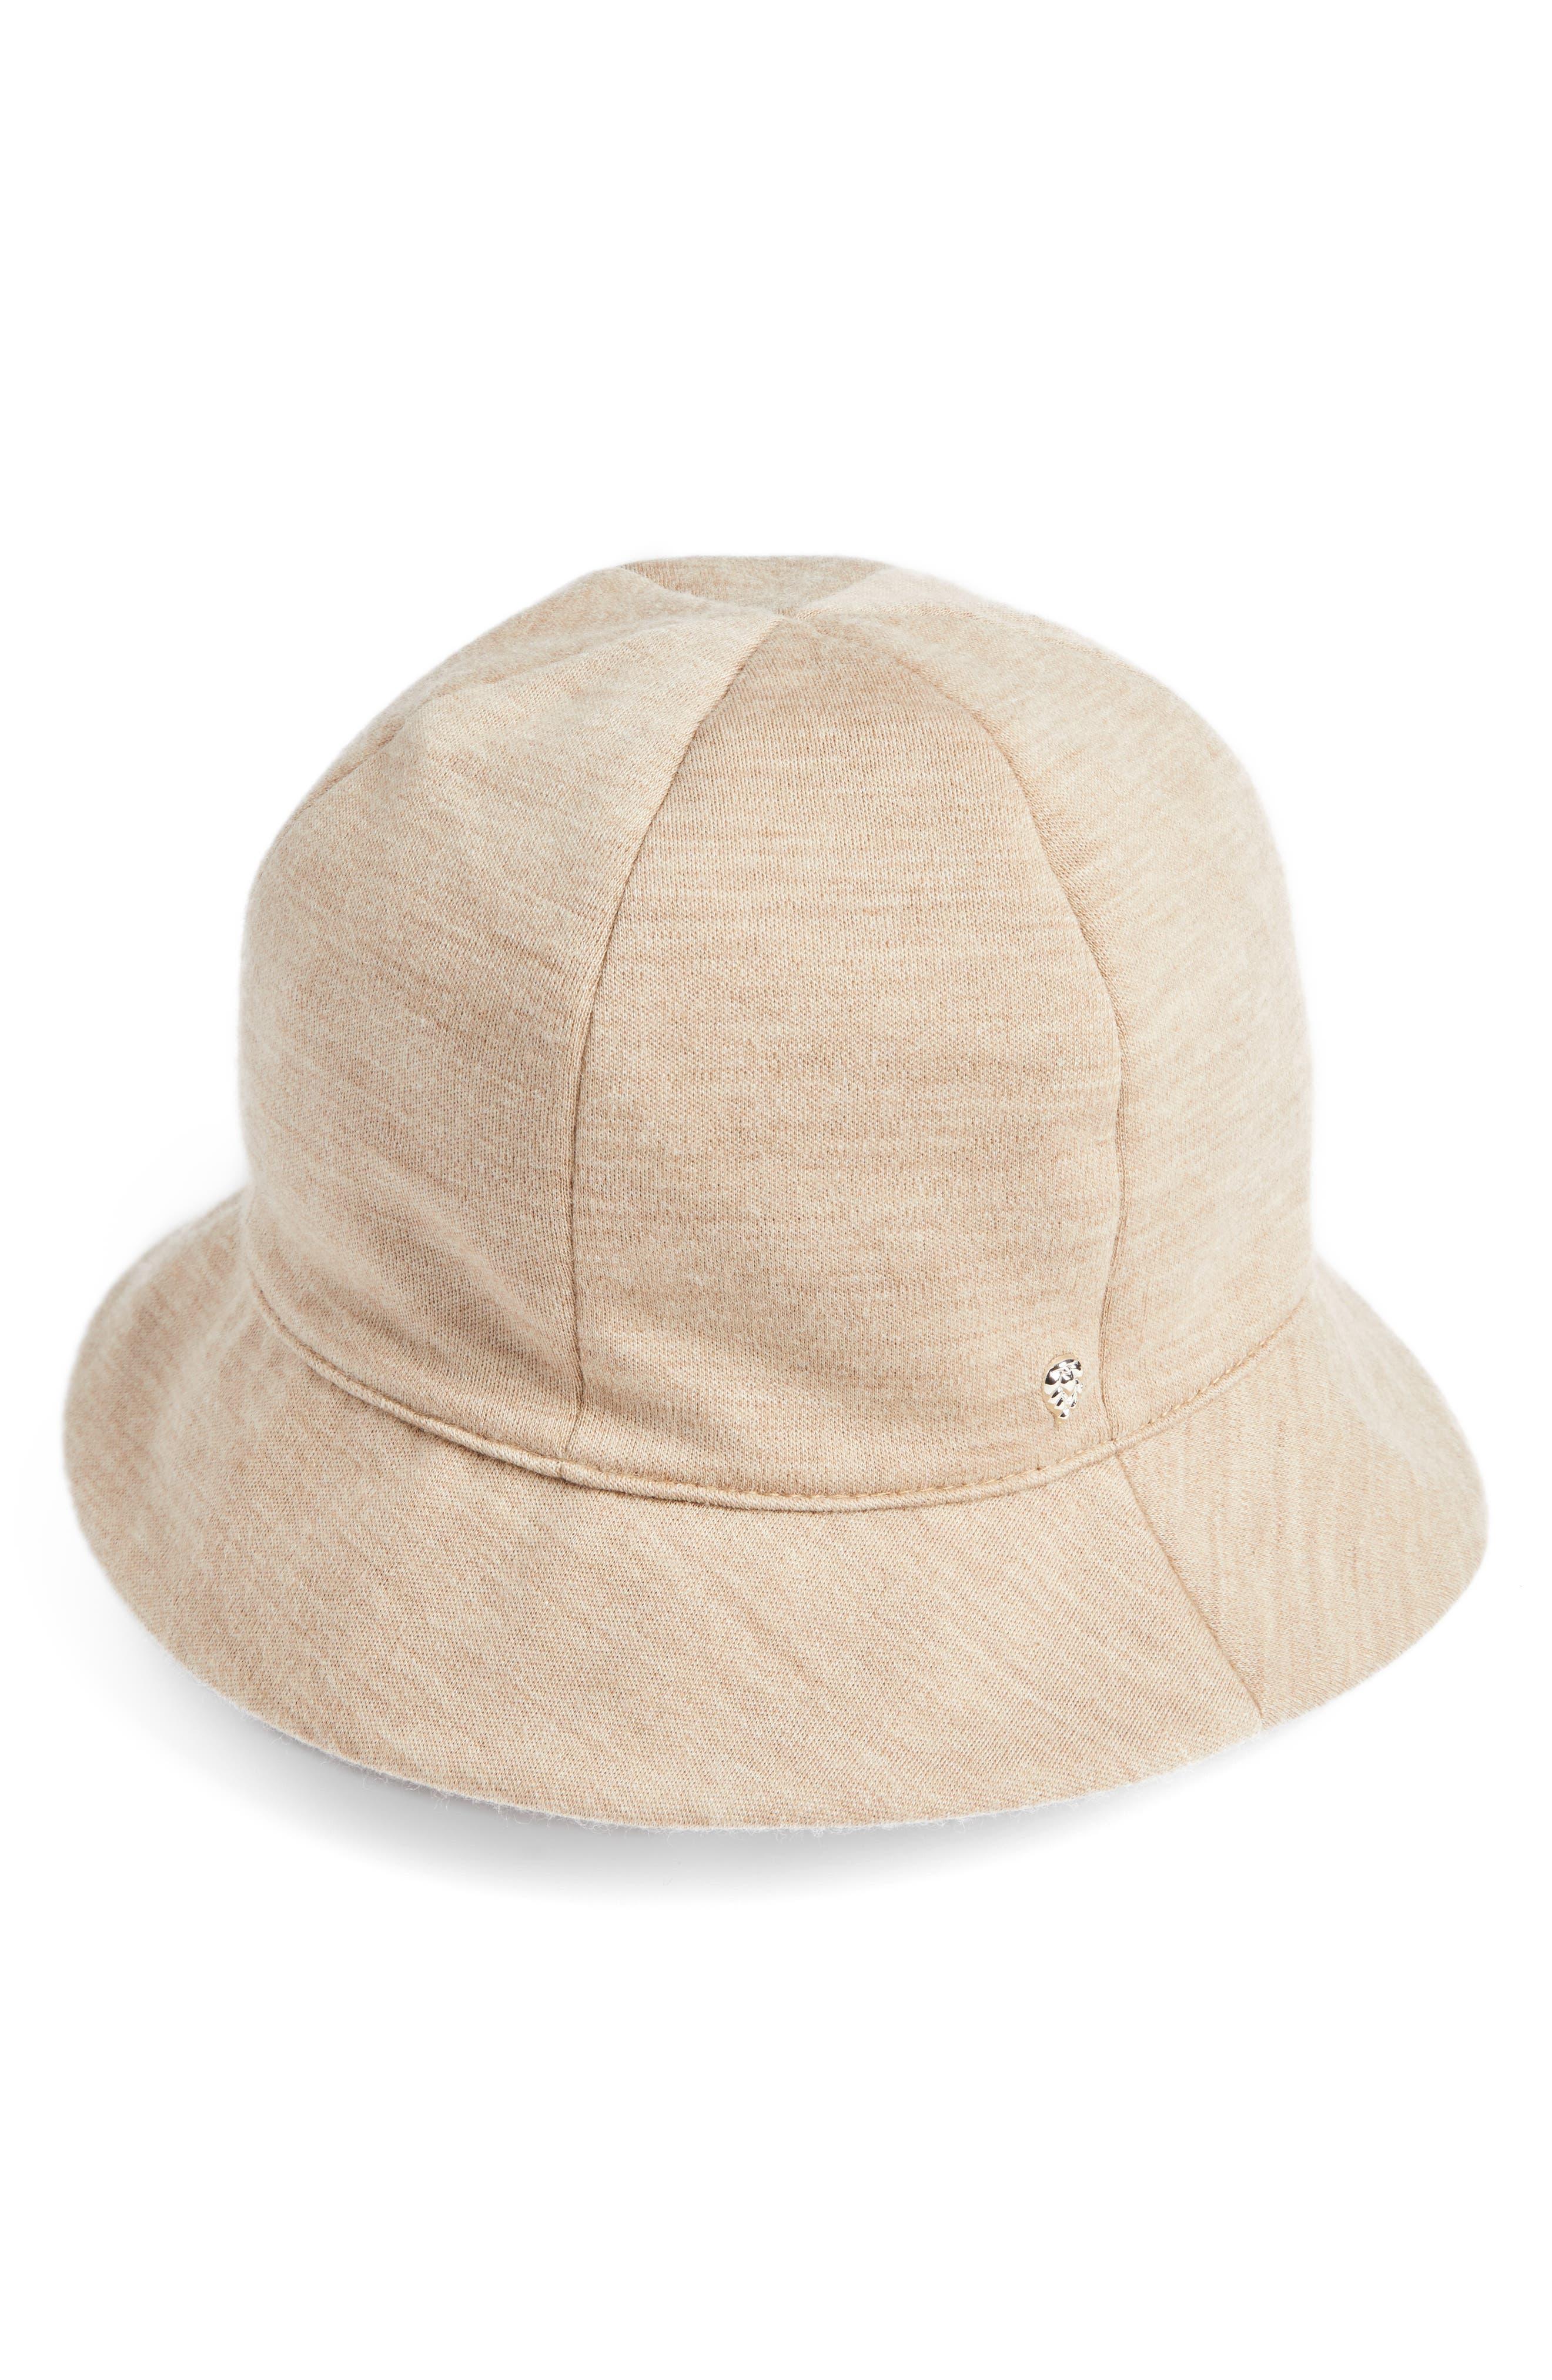 Merino Wool Jersey Bucket Hat,                         Main,                         color, Camel Melange